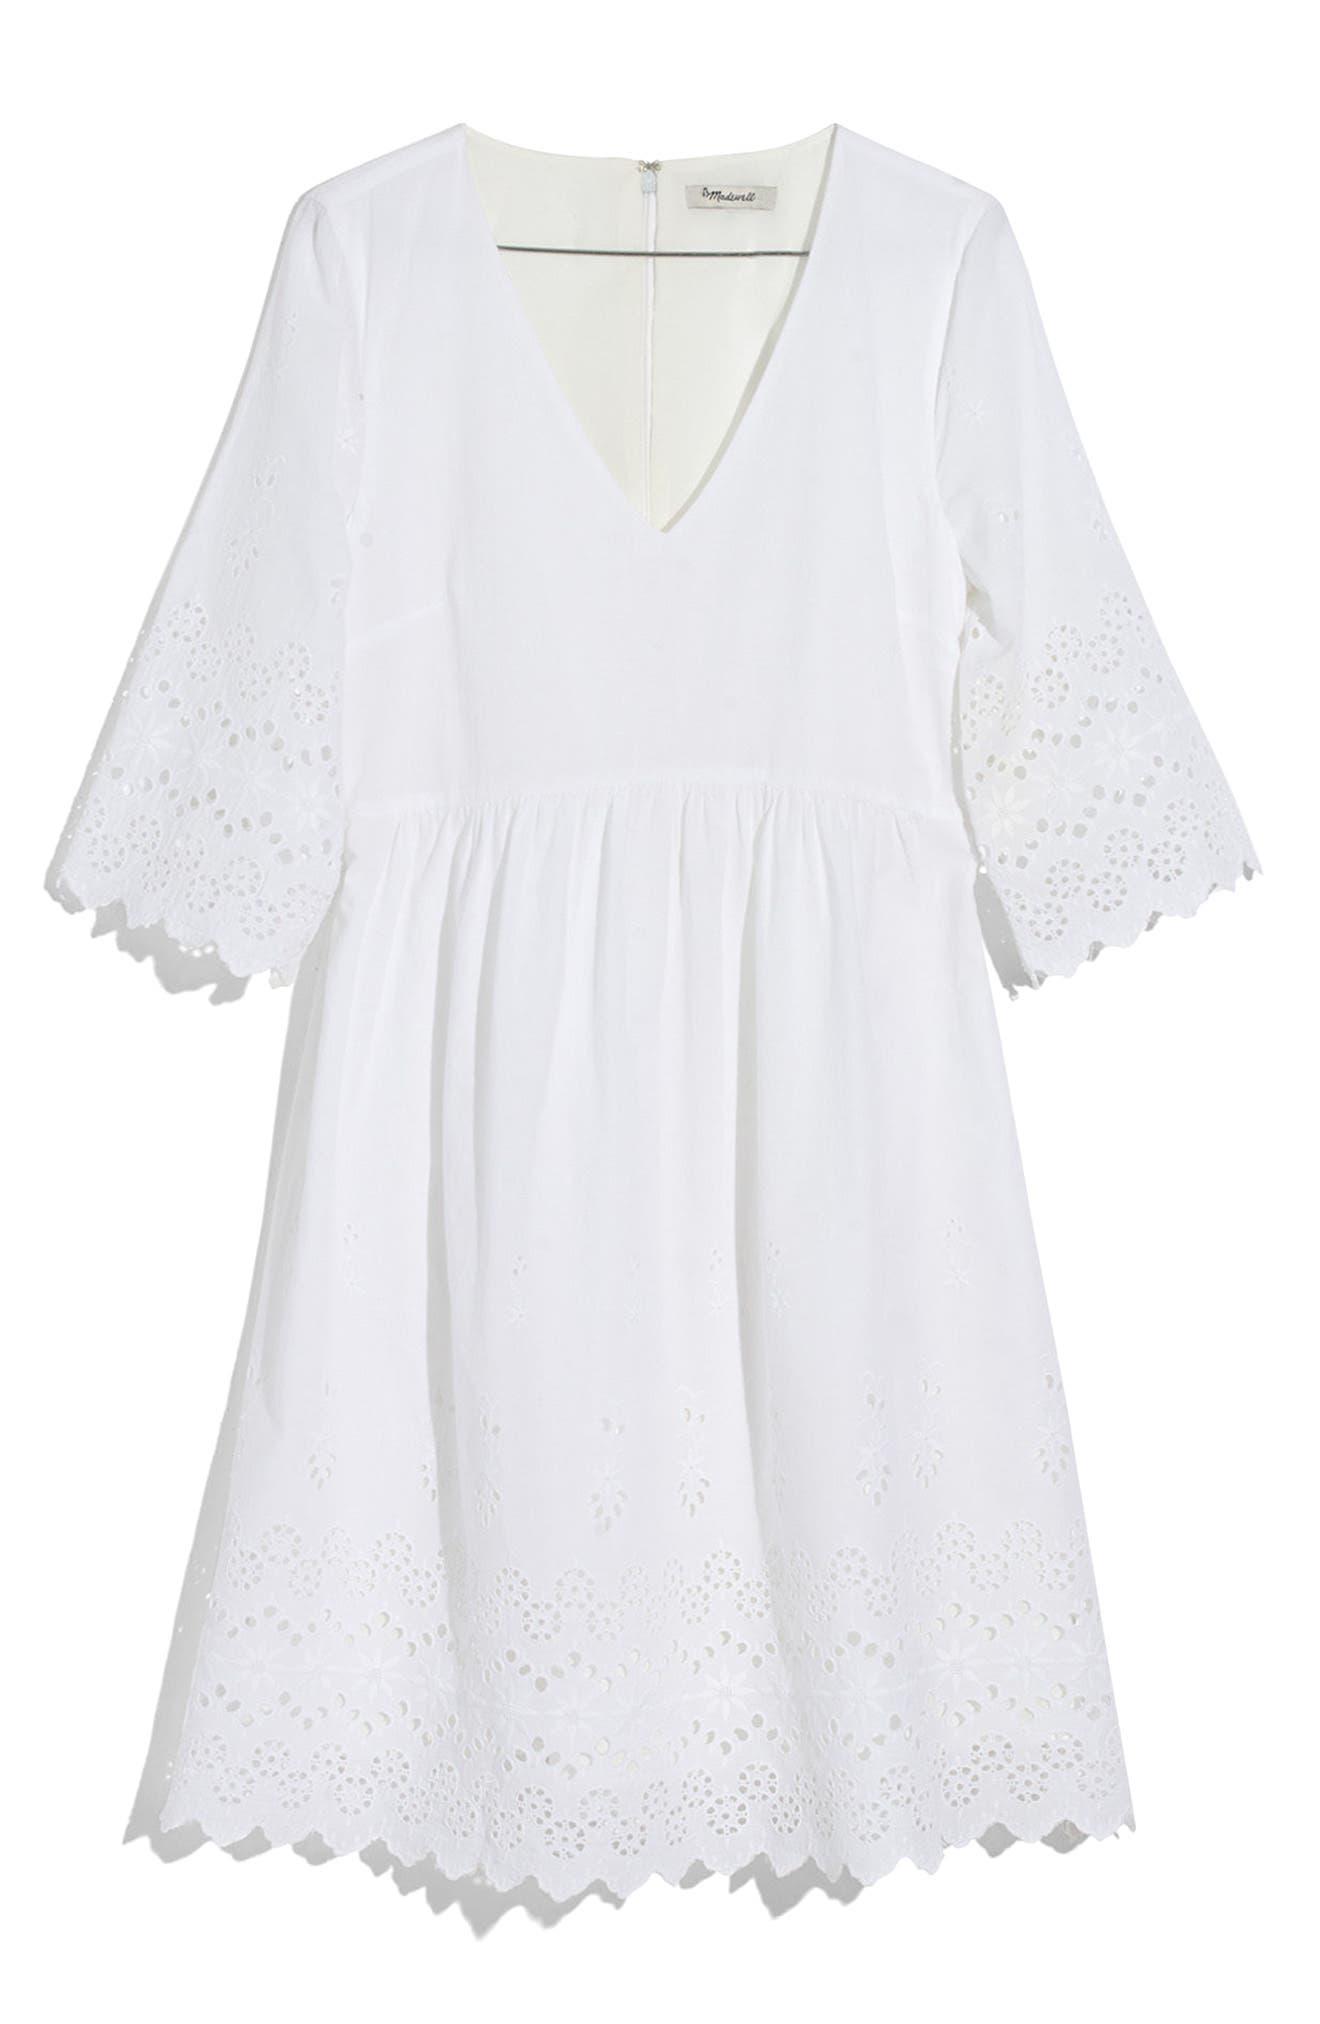 Eyelet Lattice Dress,                             Main thumbnail 1, color,                             100